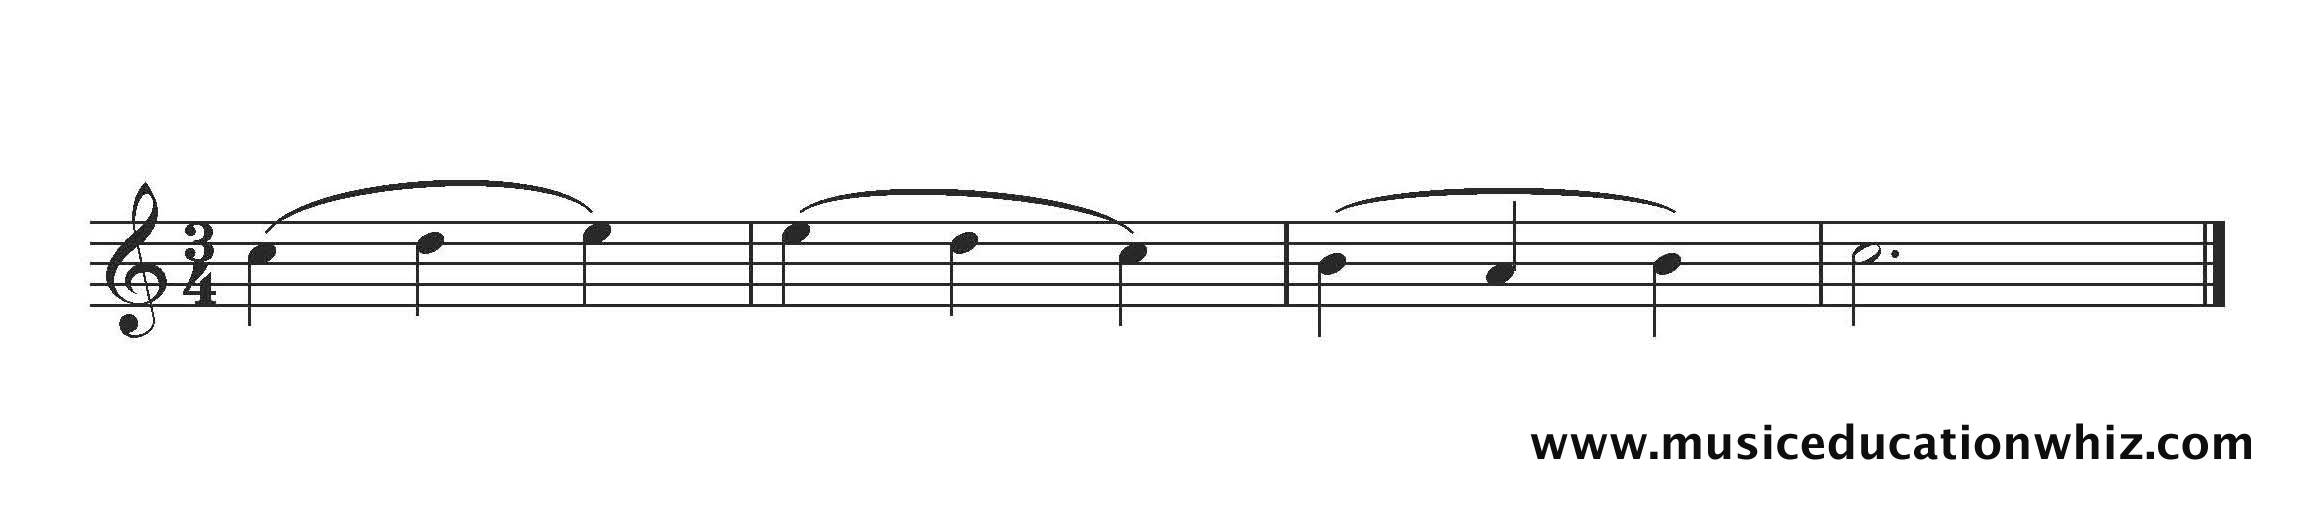 Passage of music with slurs